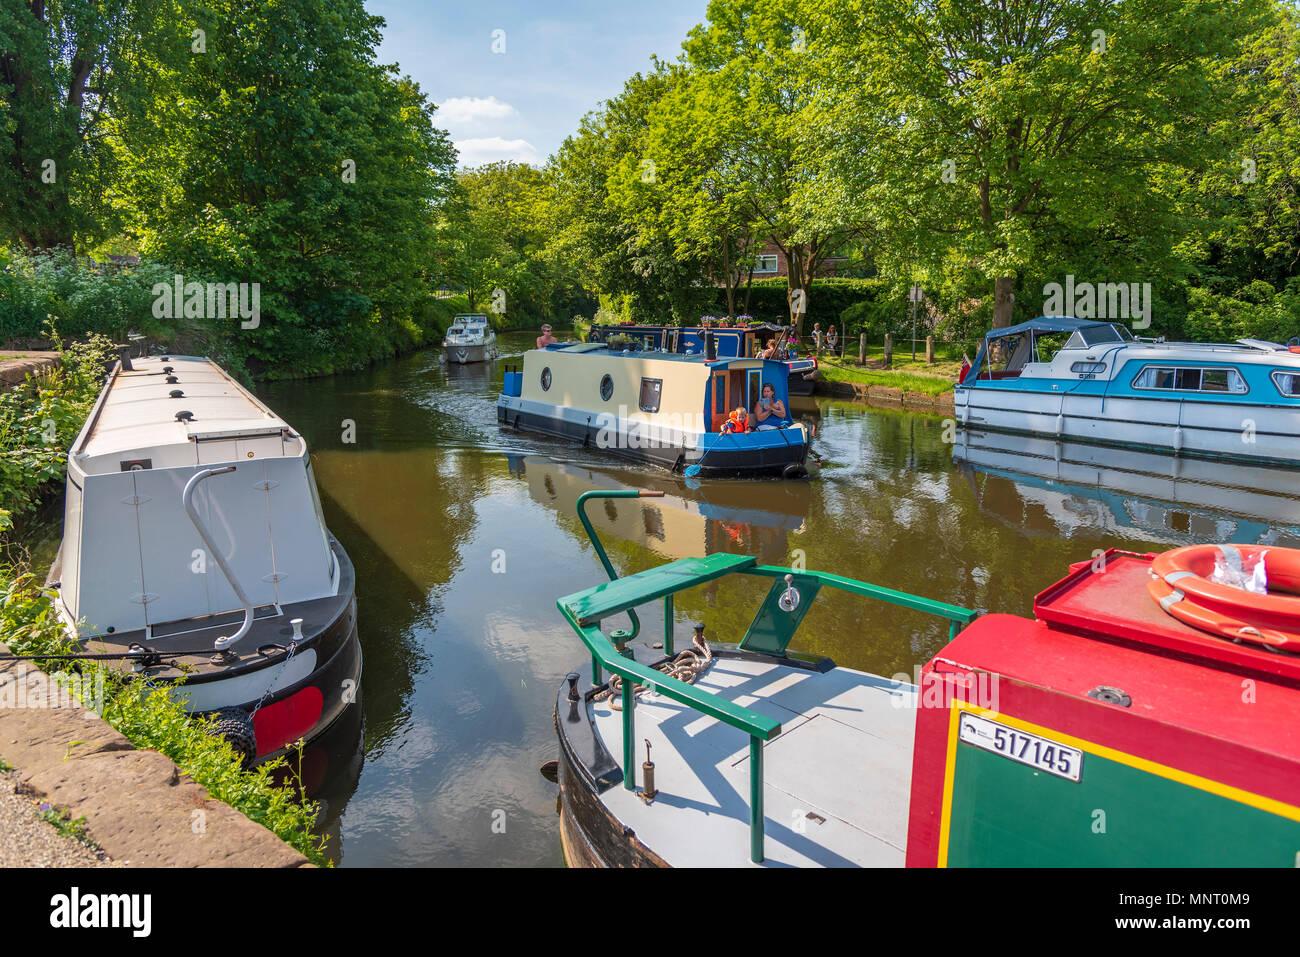 Lymm. Cheshire. North West England. Bridgewater canal. - Stock Image